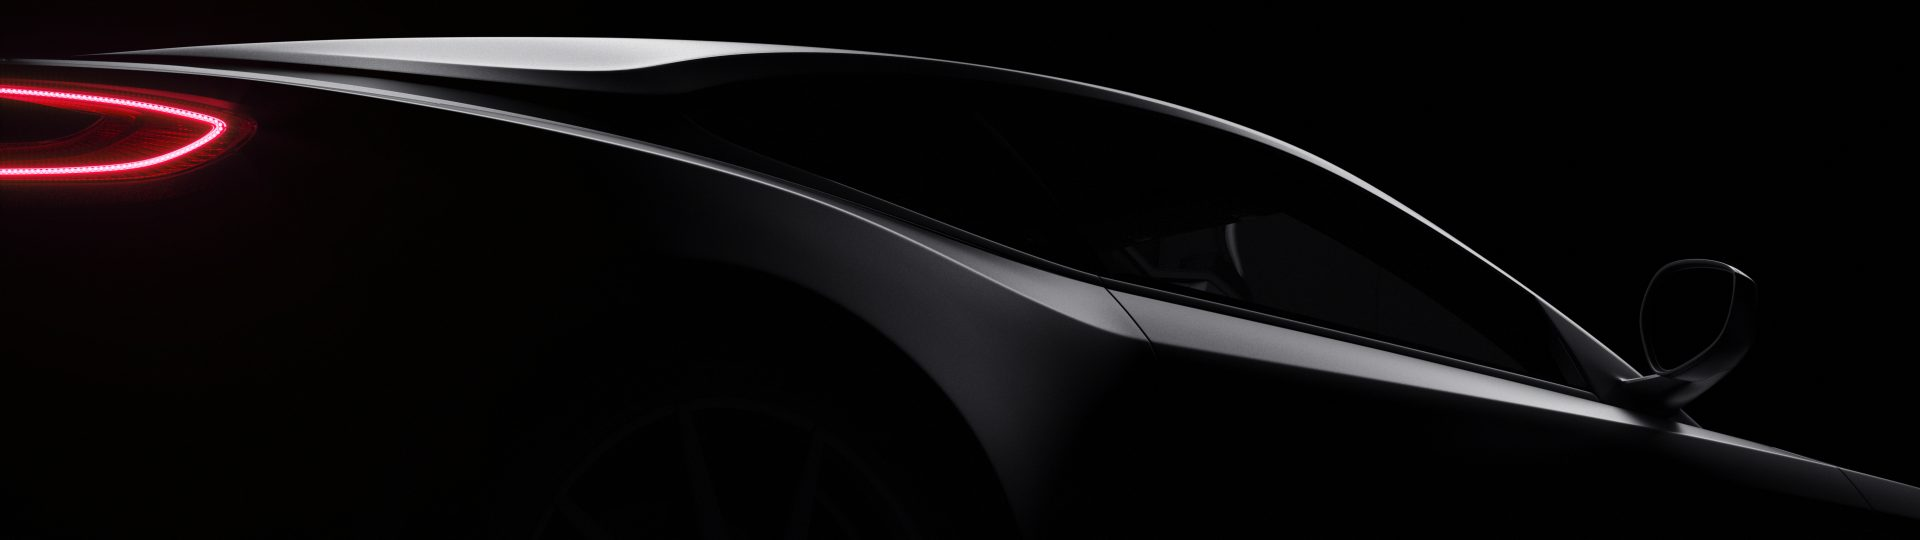 Aston Martin DB11 2017 - Silhouette